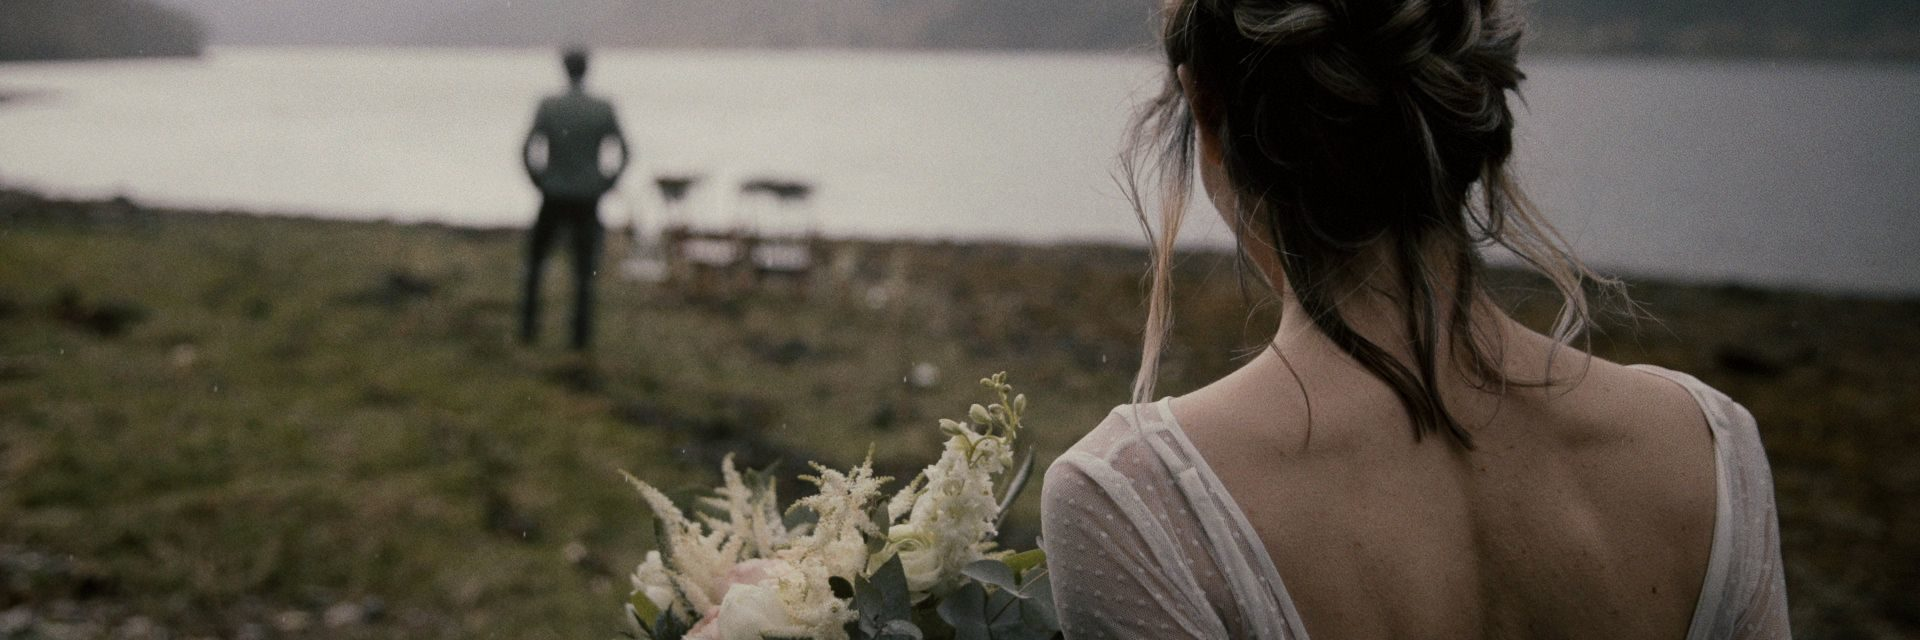 Piedmont-wedding-videographer-cinemate-films-02